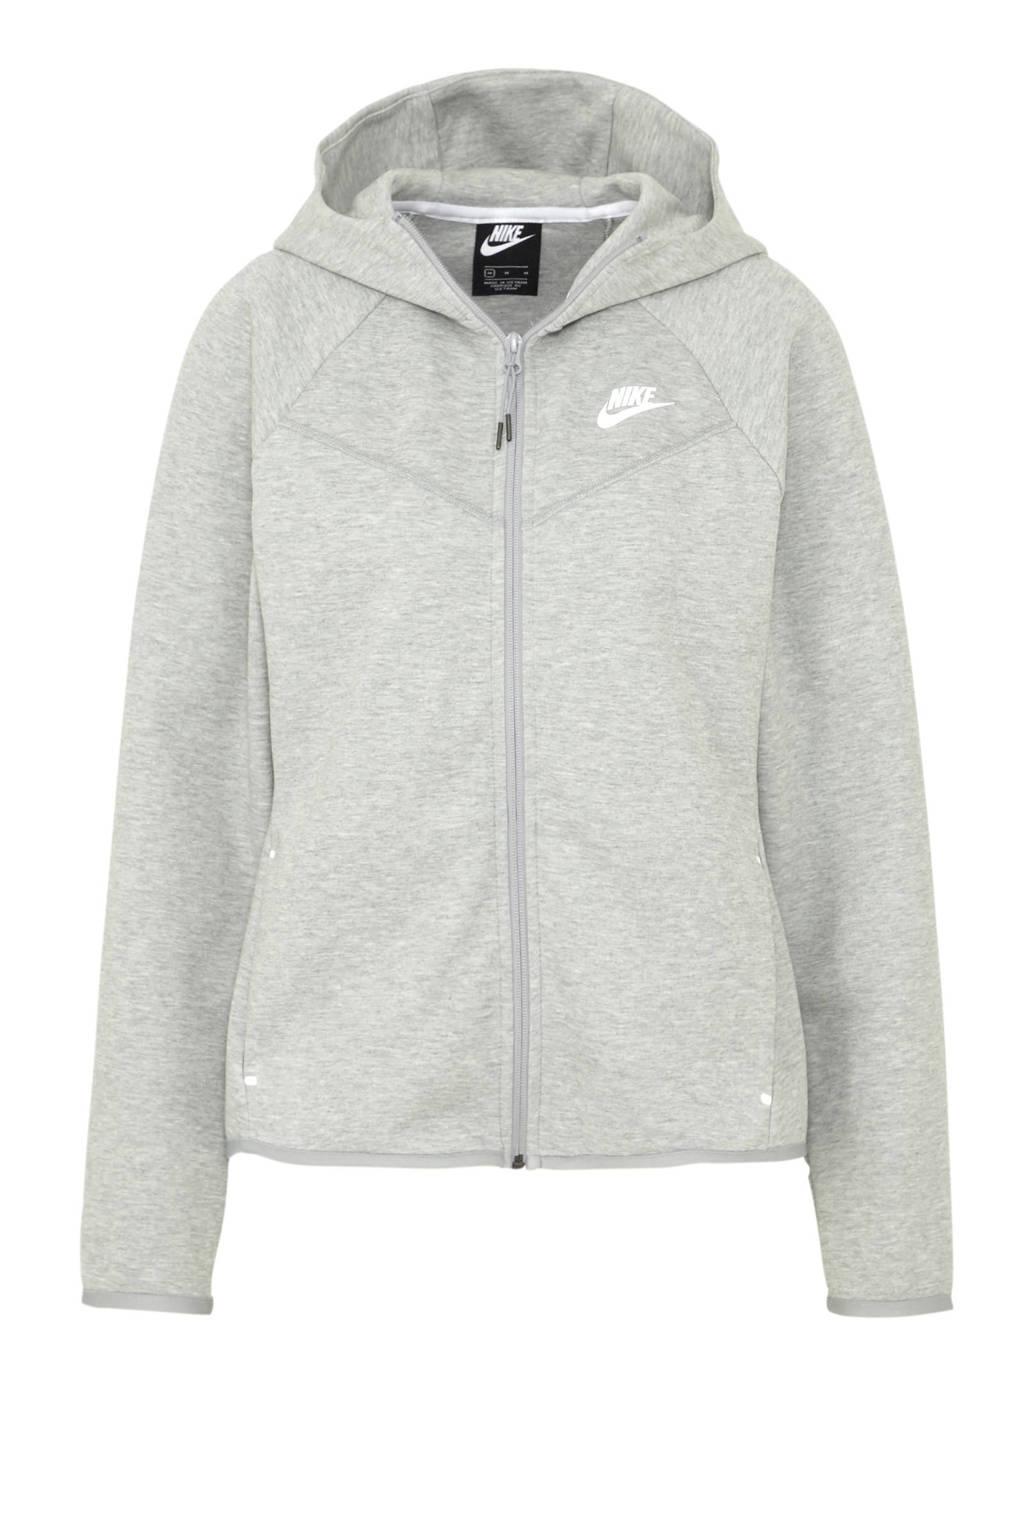 Nike Tech Fleece vest grijs, Grijs